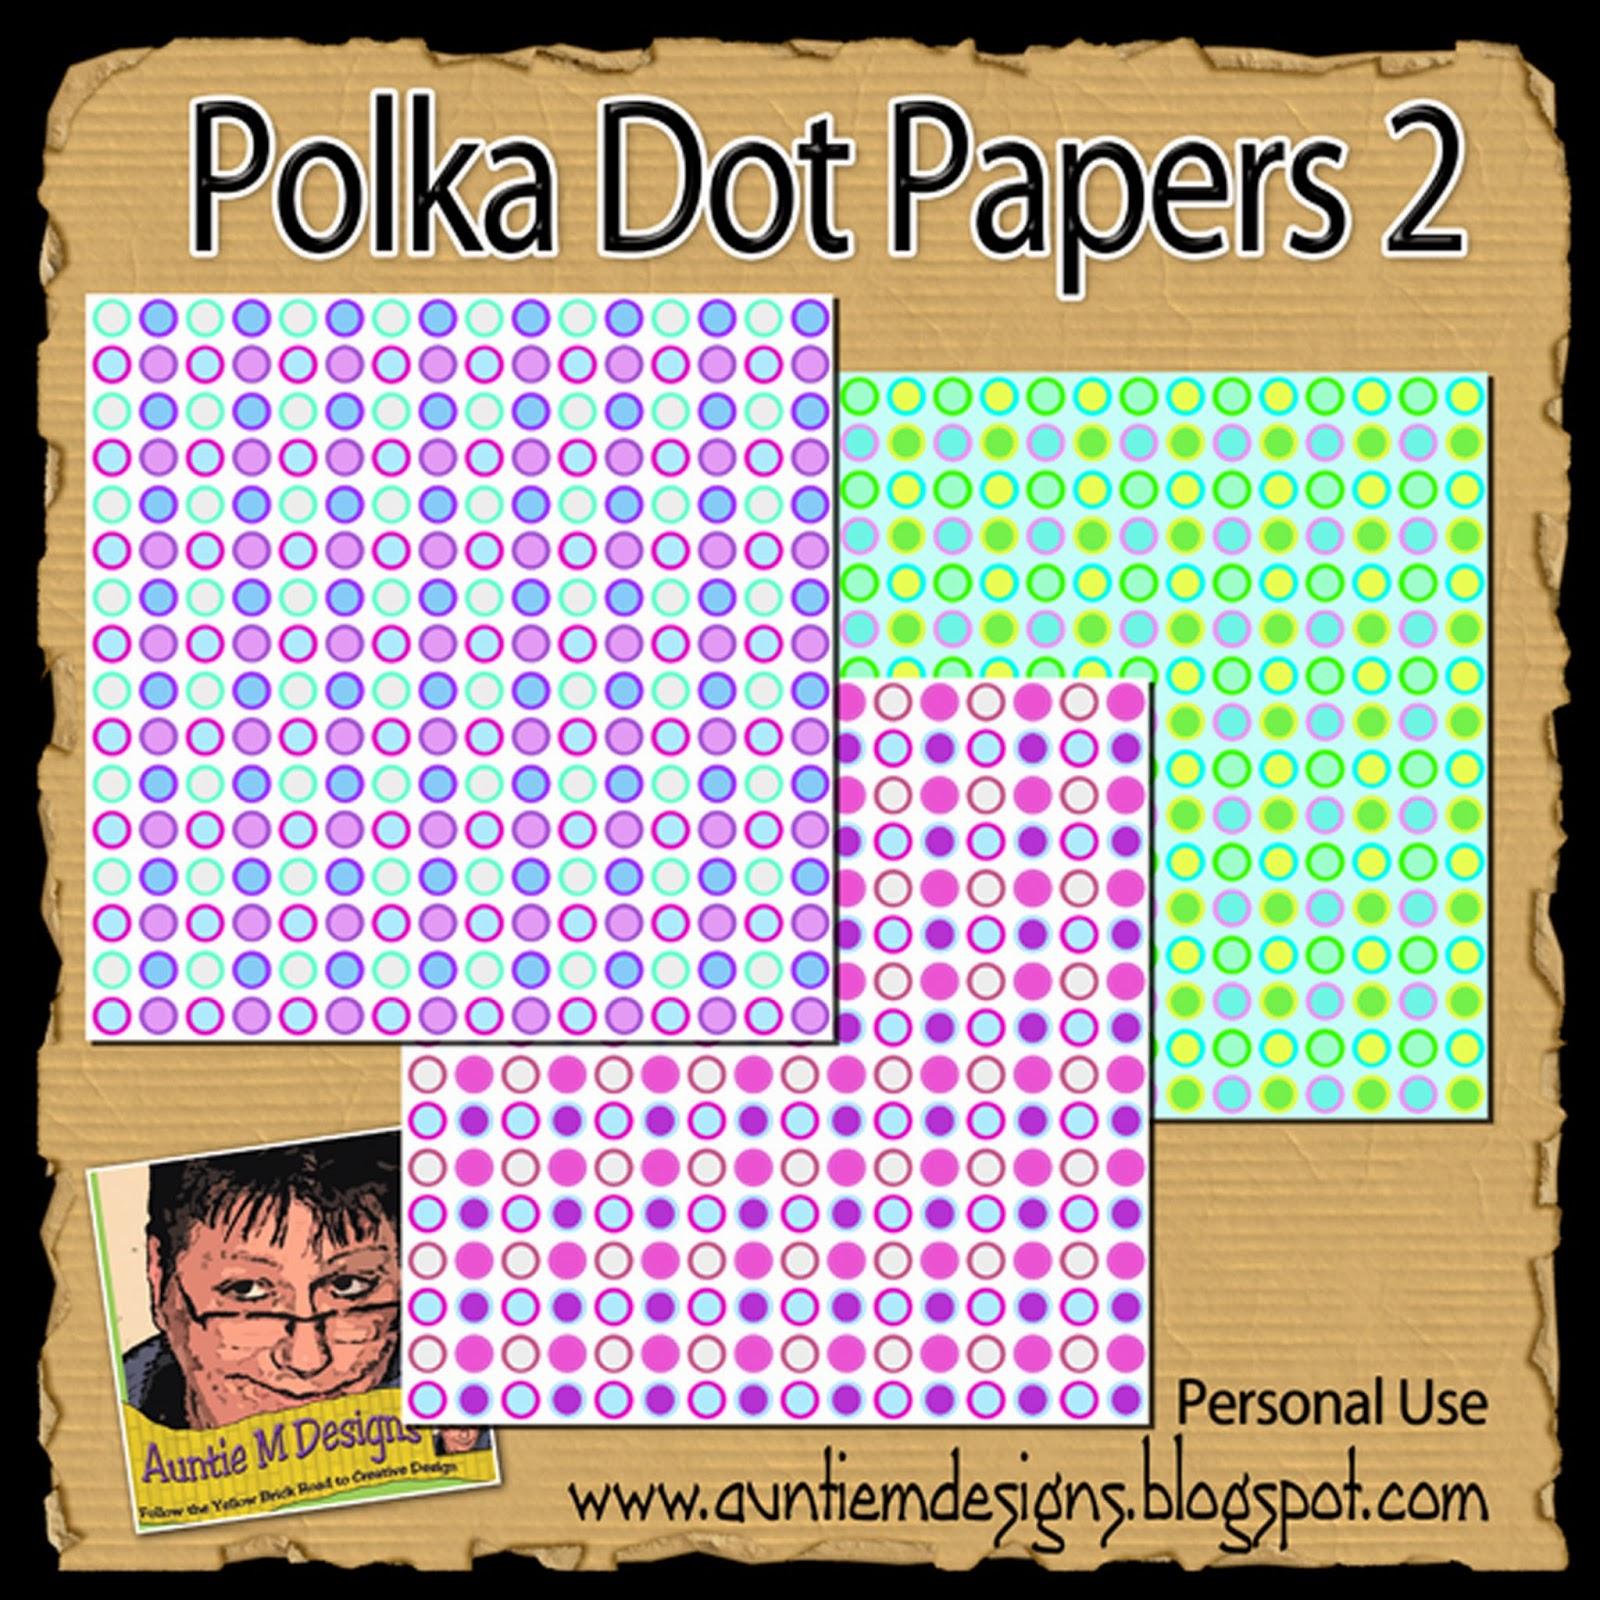 http://2.bp.blogspot.com/-mWTBGfBYan0/U5Szw6jm5OI/AAAAAAAAGwI/i4H5yydyA48/s1600/folder2.jpg